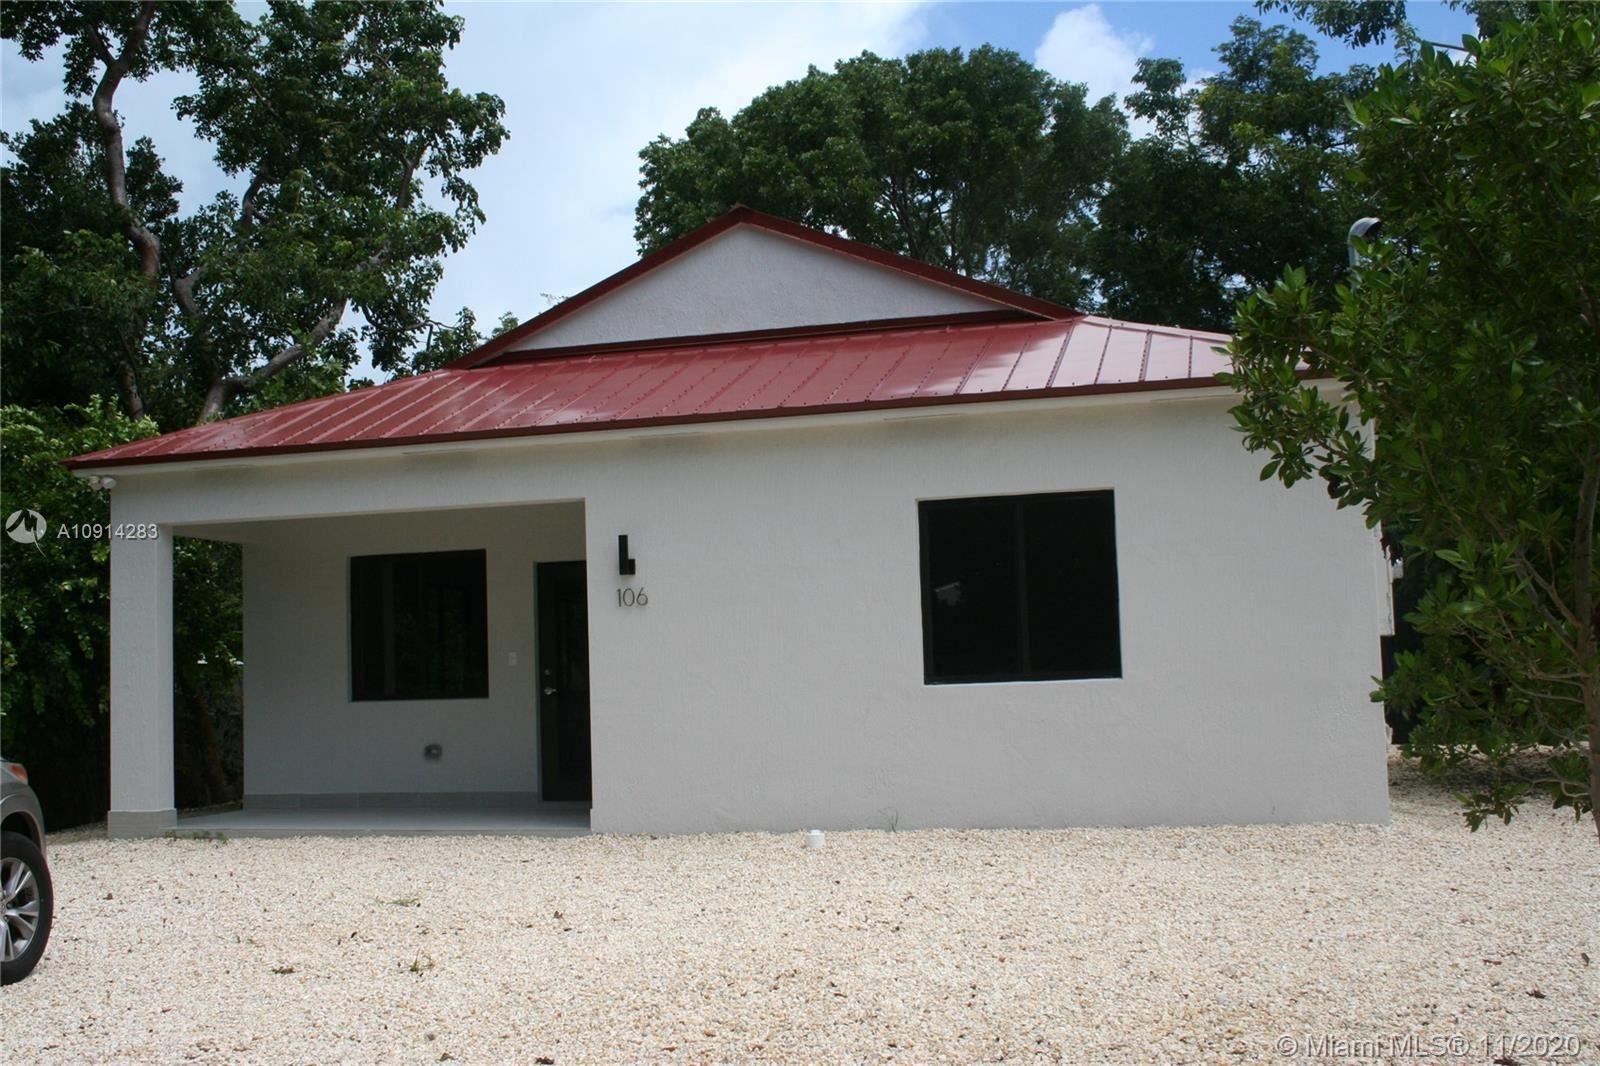 110 S Bay Harbor Dr., Key Largo, FL 33037 - #: A10914283